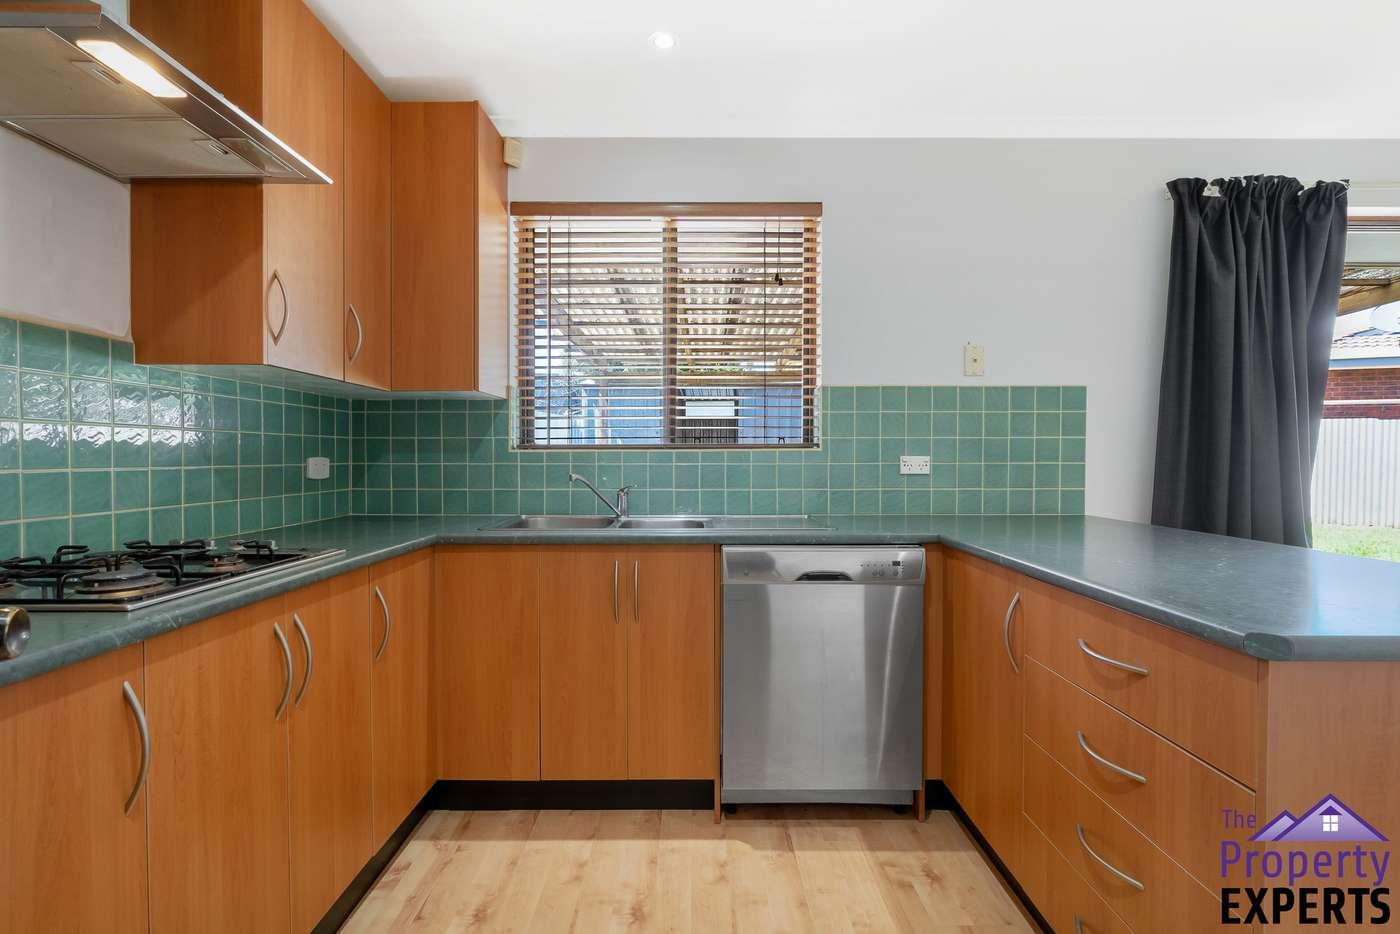 Fifth view of Homely house listing, 6 Kingsbridge Drive, Morphett Vale SA 5162